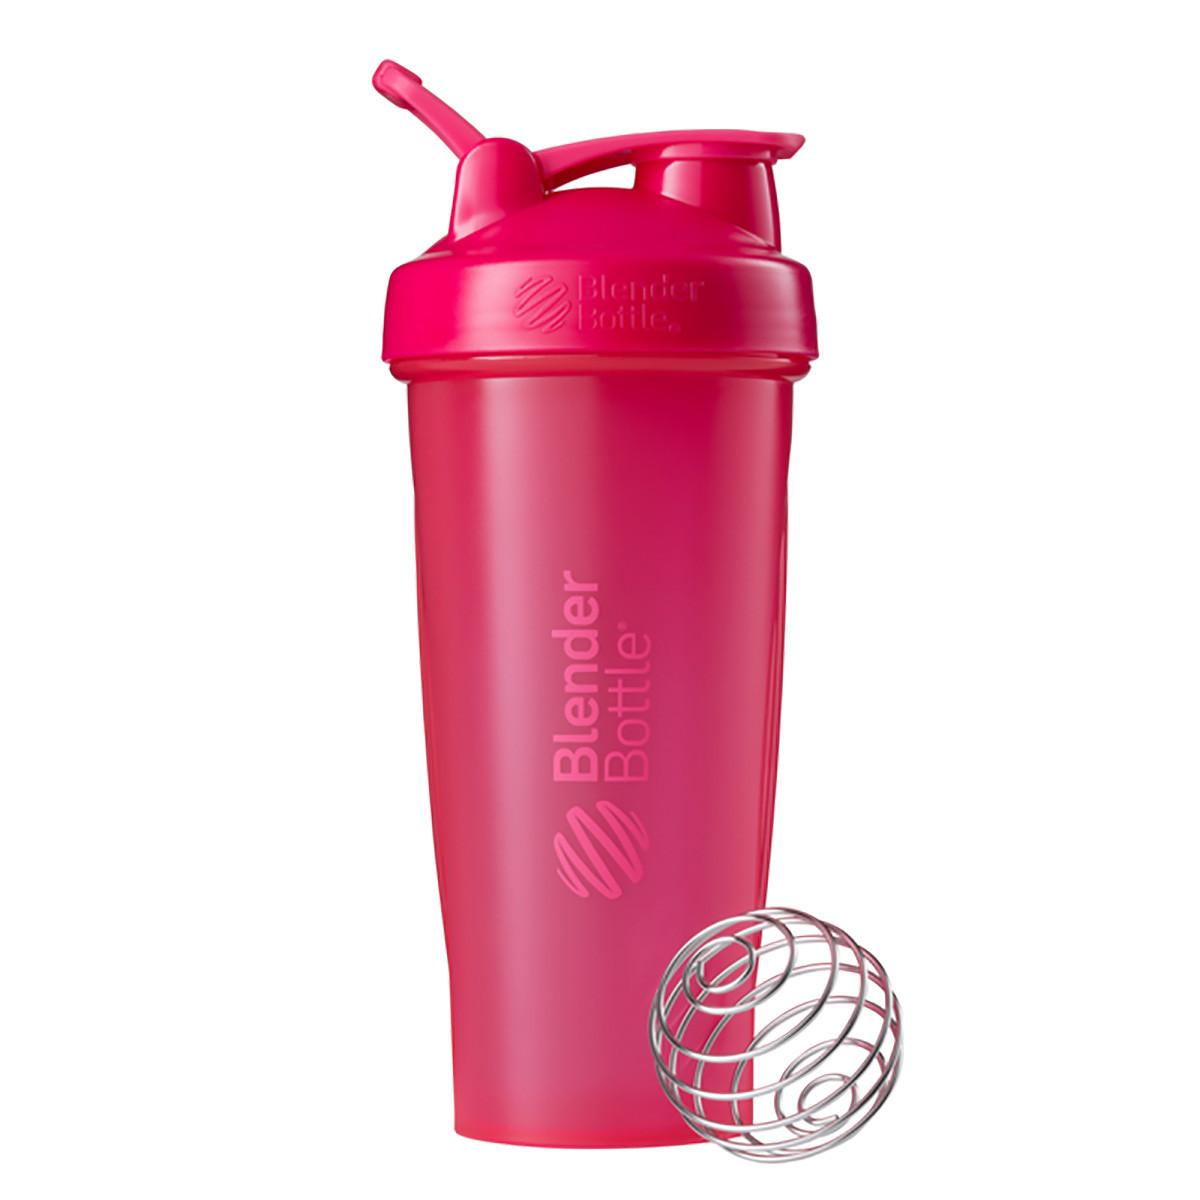 Blender Bottle 运动水壶摇摇杯经典款蛋白粉户外杯奶昔杯水杯运动杯28oz